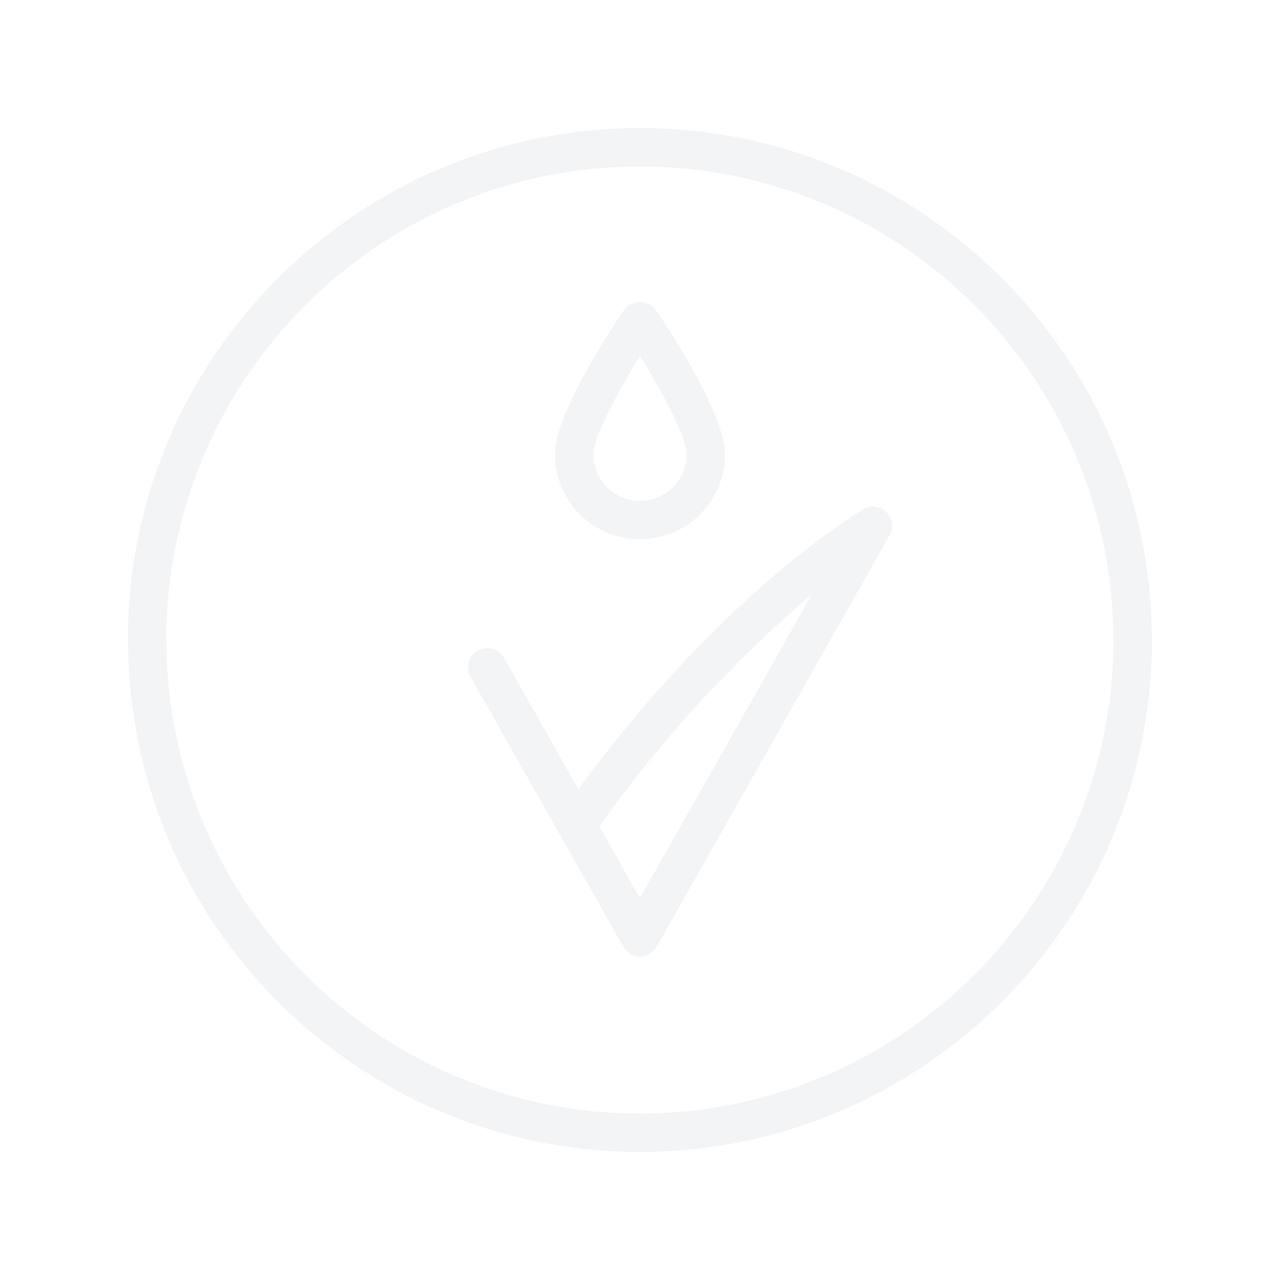 ALESSANDRO Nail Polish No.905 Rouge Noir 5ml